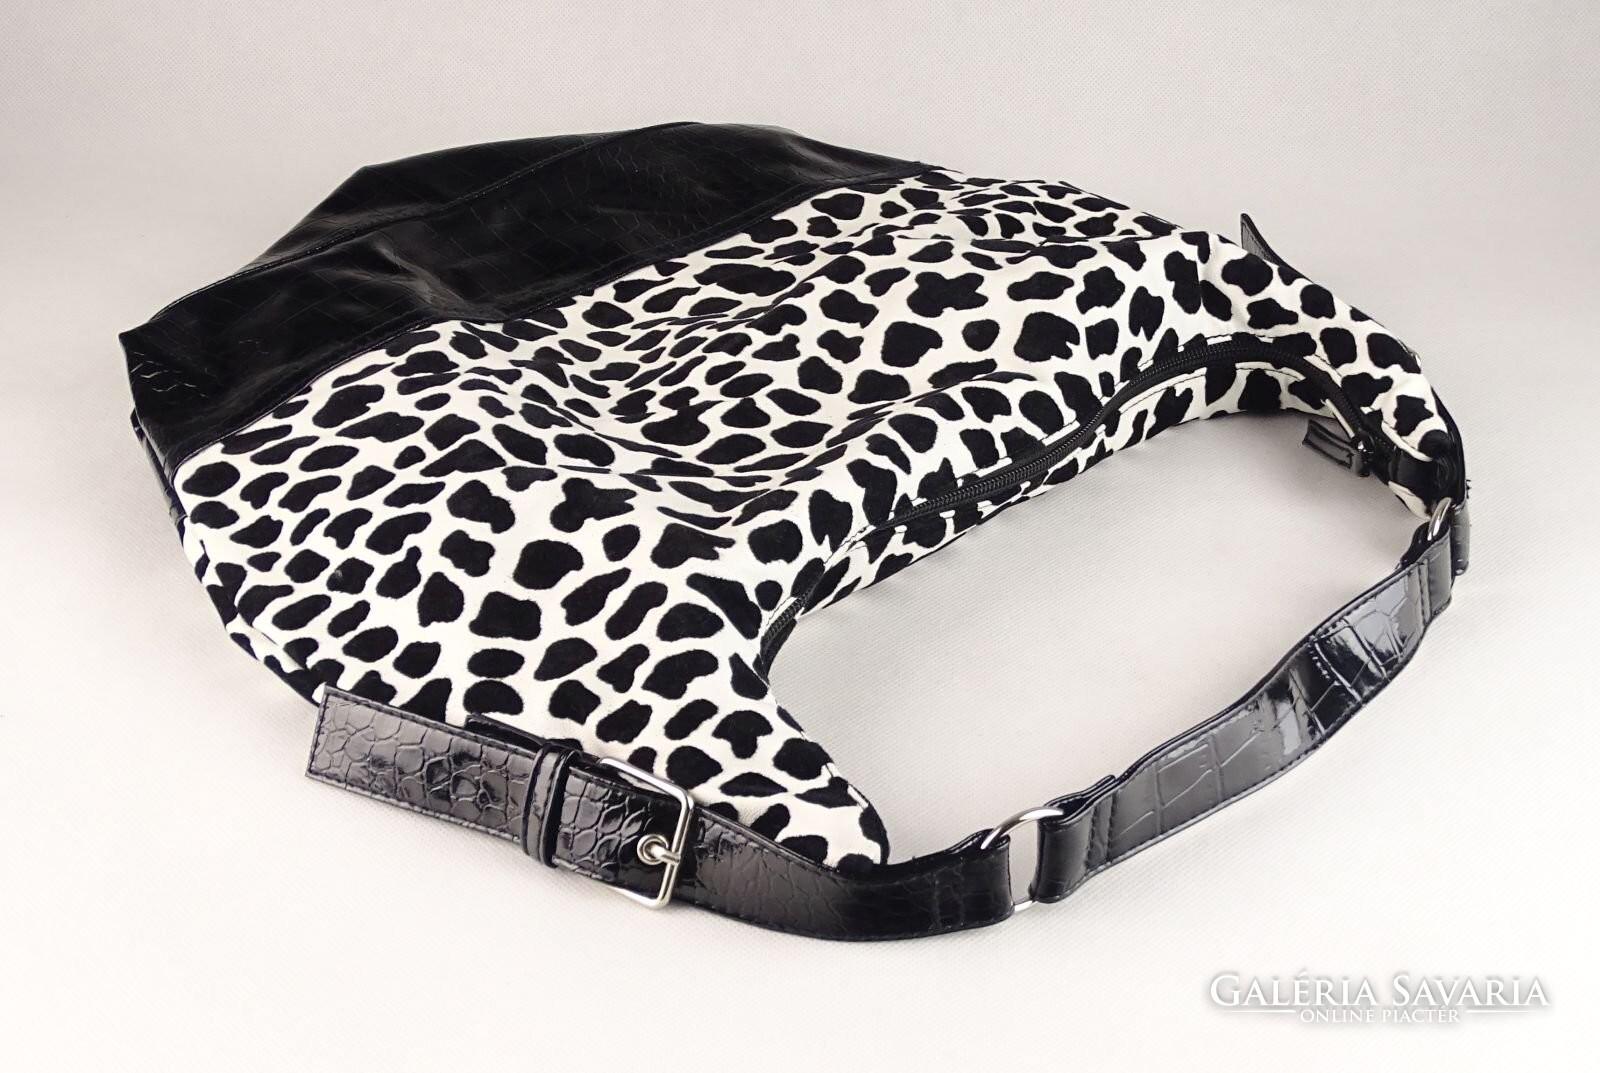 0V560 Claire s fekete-fehér válltáska - Wardrobe  e55d07c52e